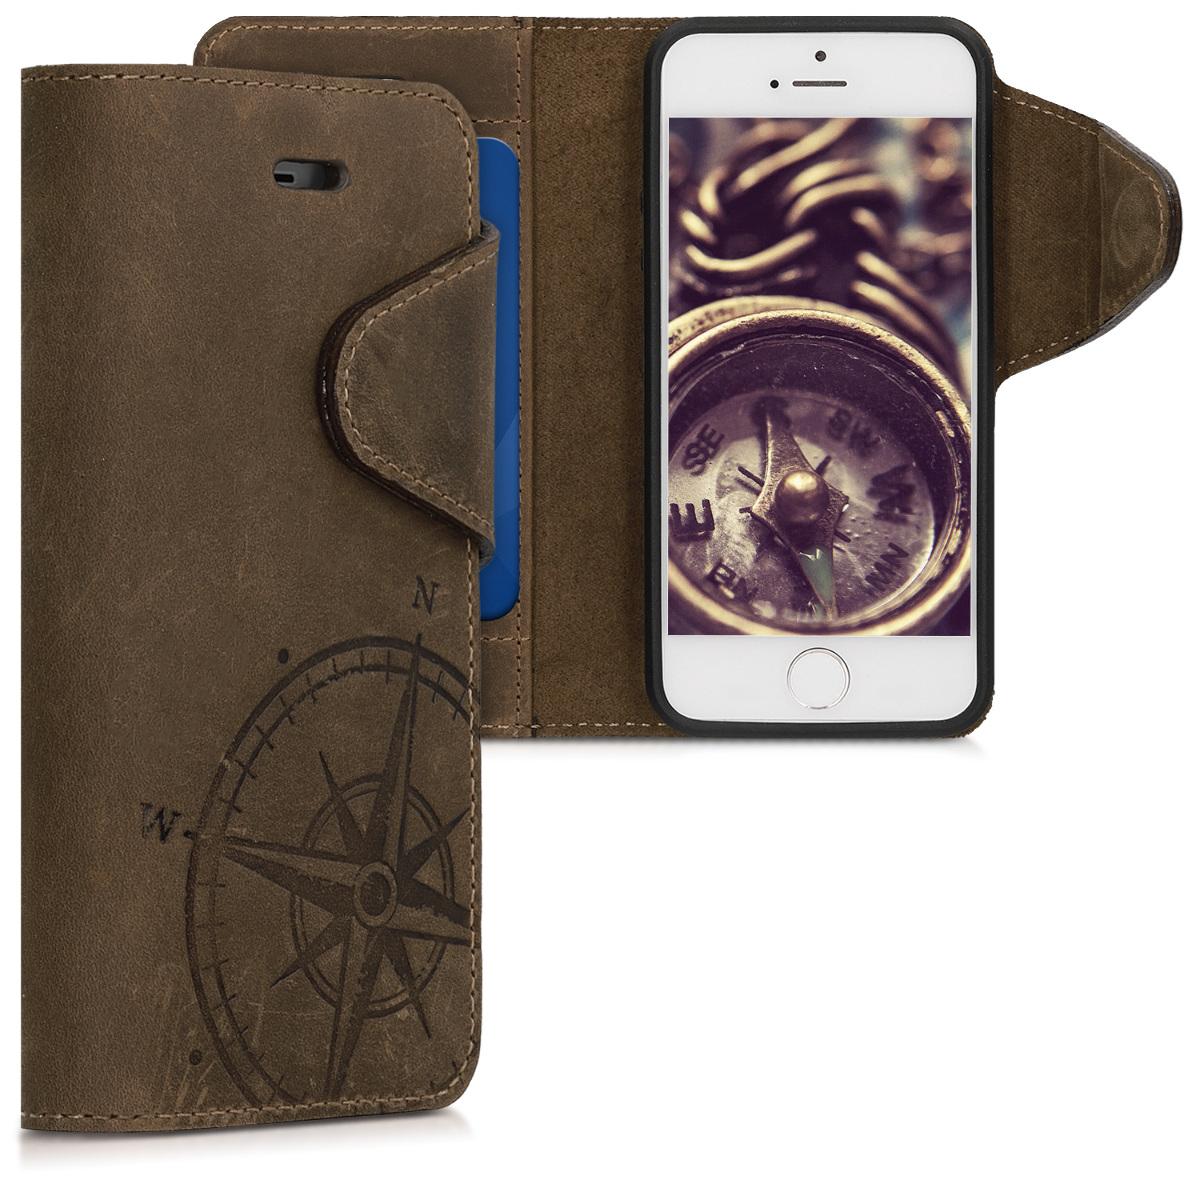 Kalibri Δερμάτινη Suede Θήκη - Πορτοφόλι iPhone SE / 5S / 5 - Καφέ(46746.01)